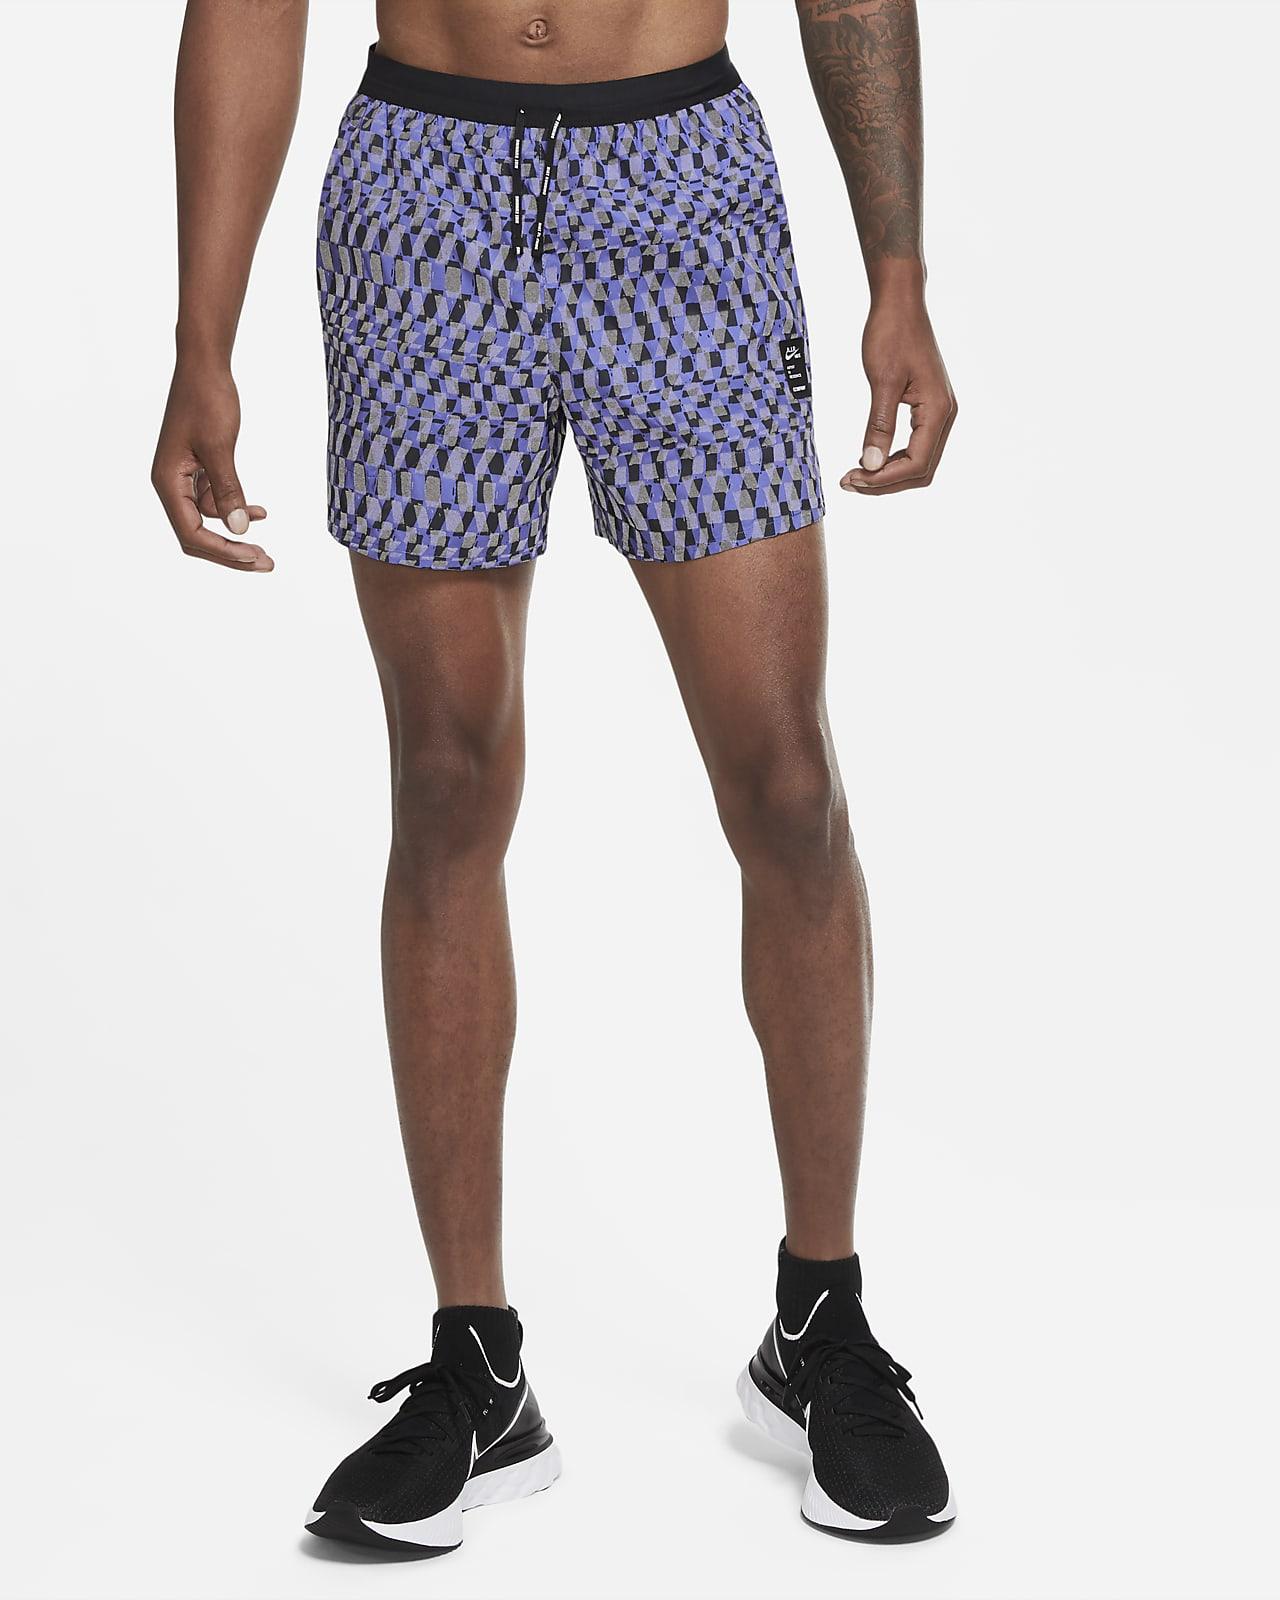 Nike Flex Stride A.I.R. กางเกงวิ่งขาสั้นผู้ชาย Chaz Bear